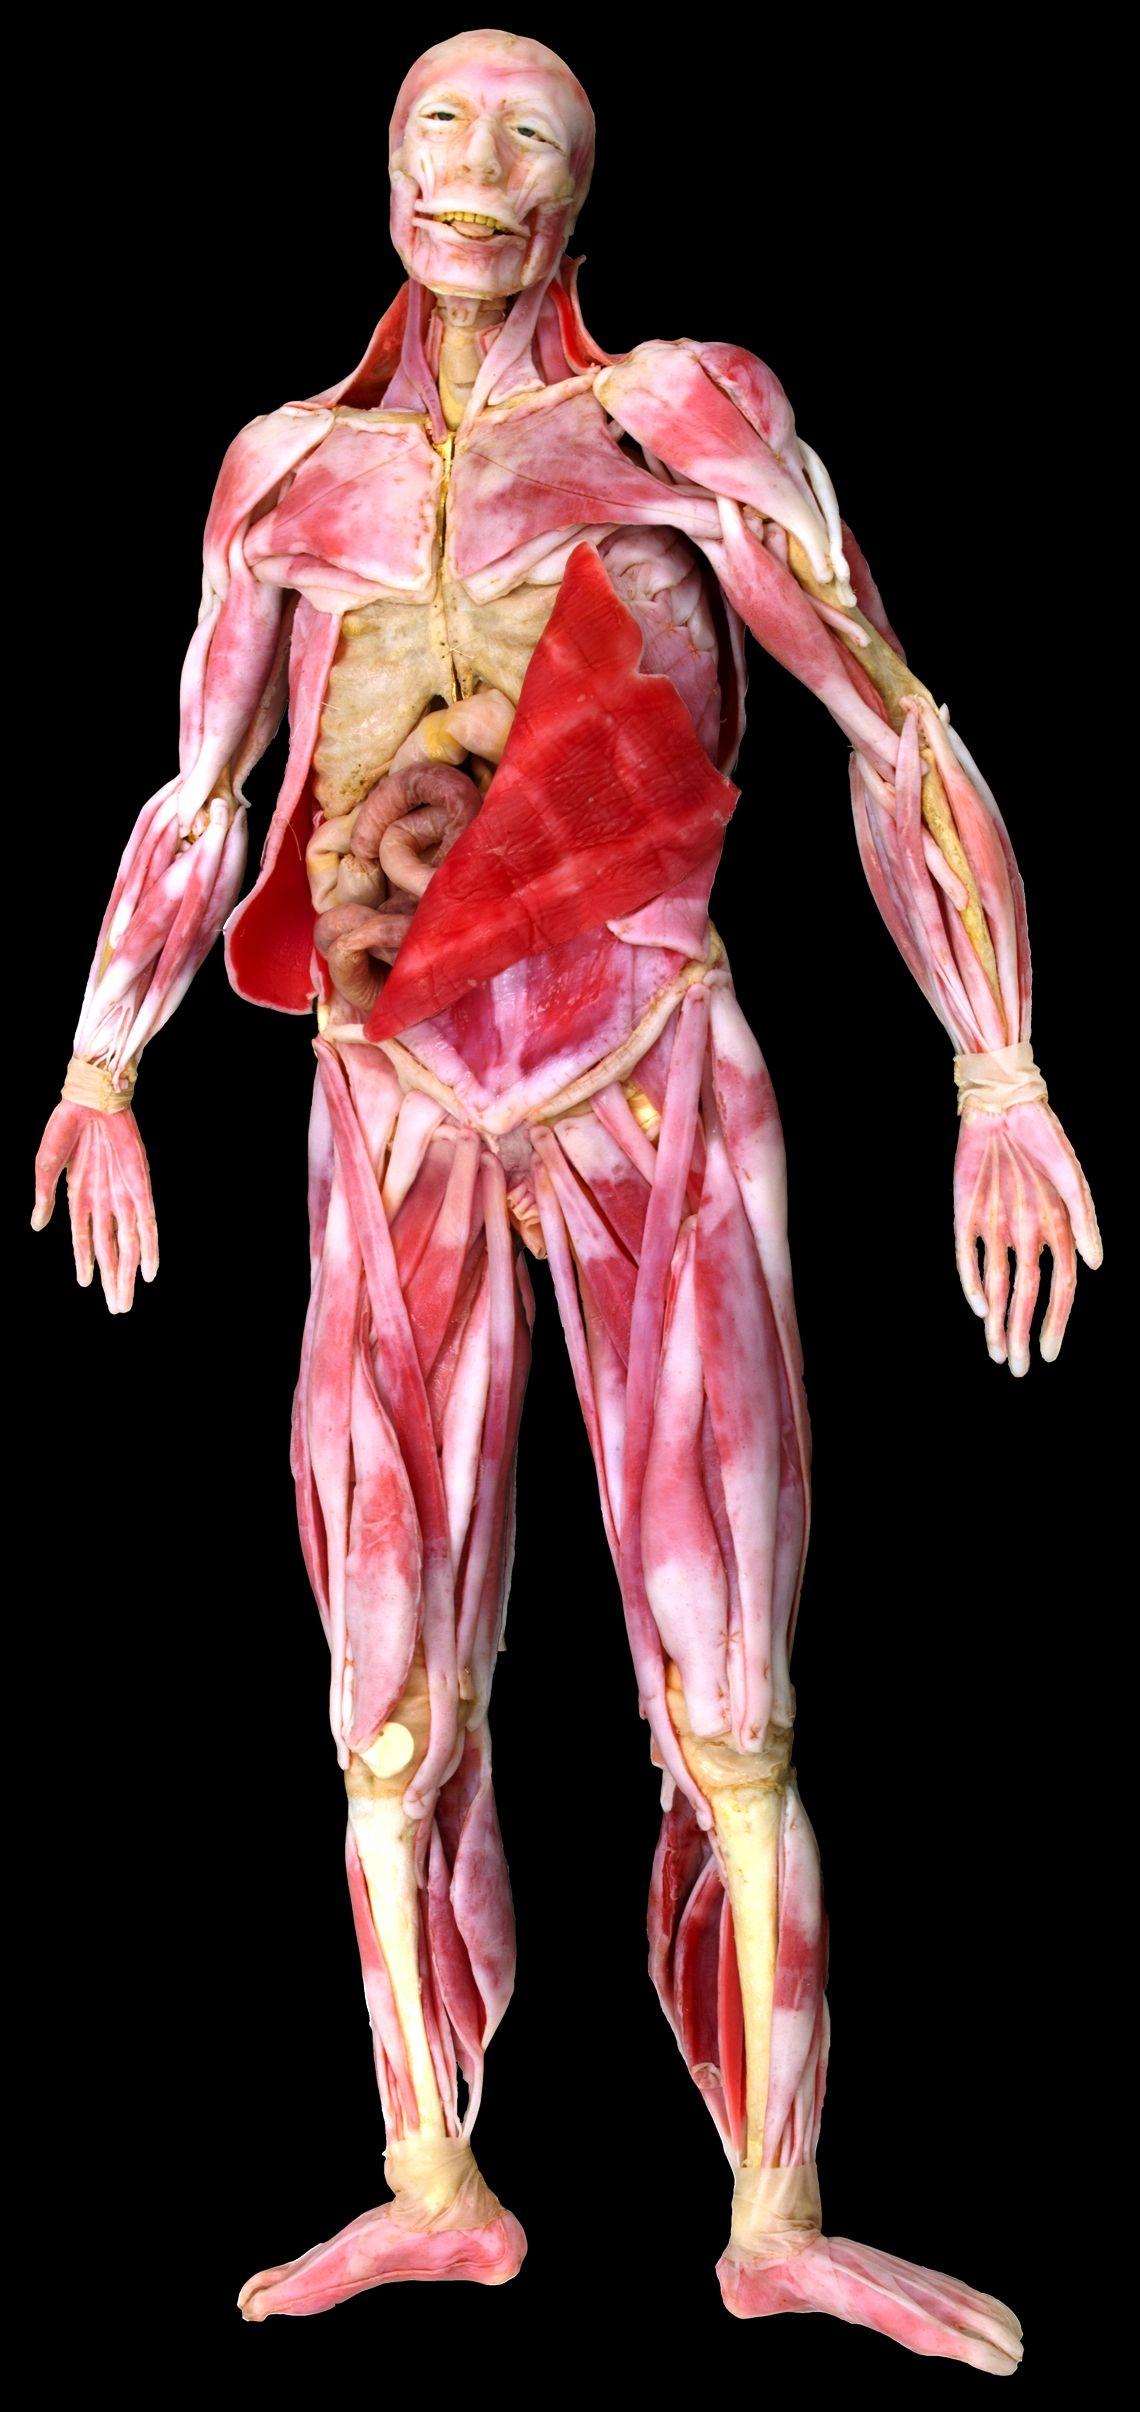 Muscular Full Body Model Includes All Of The Major Skeletal